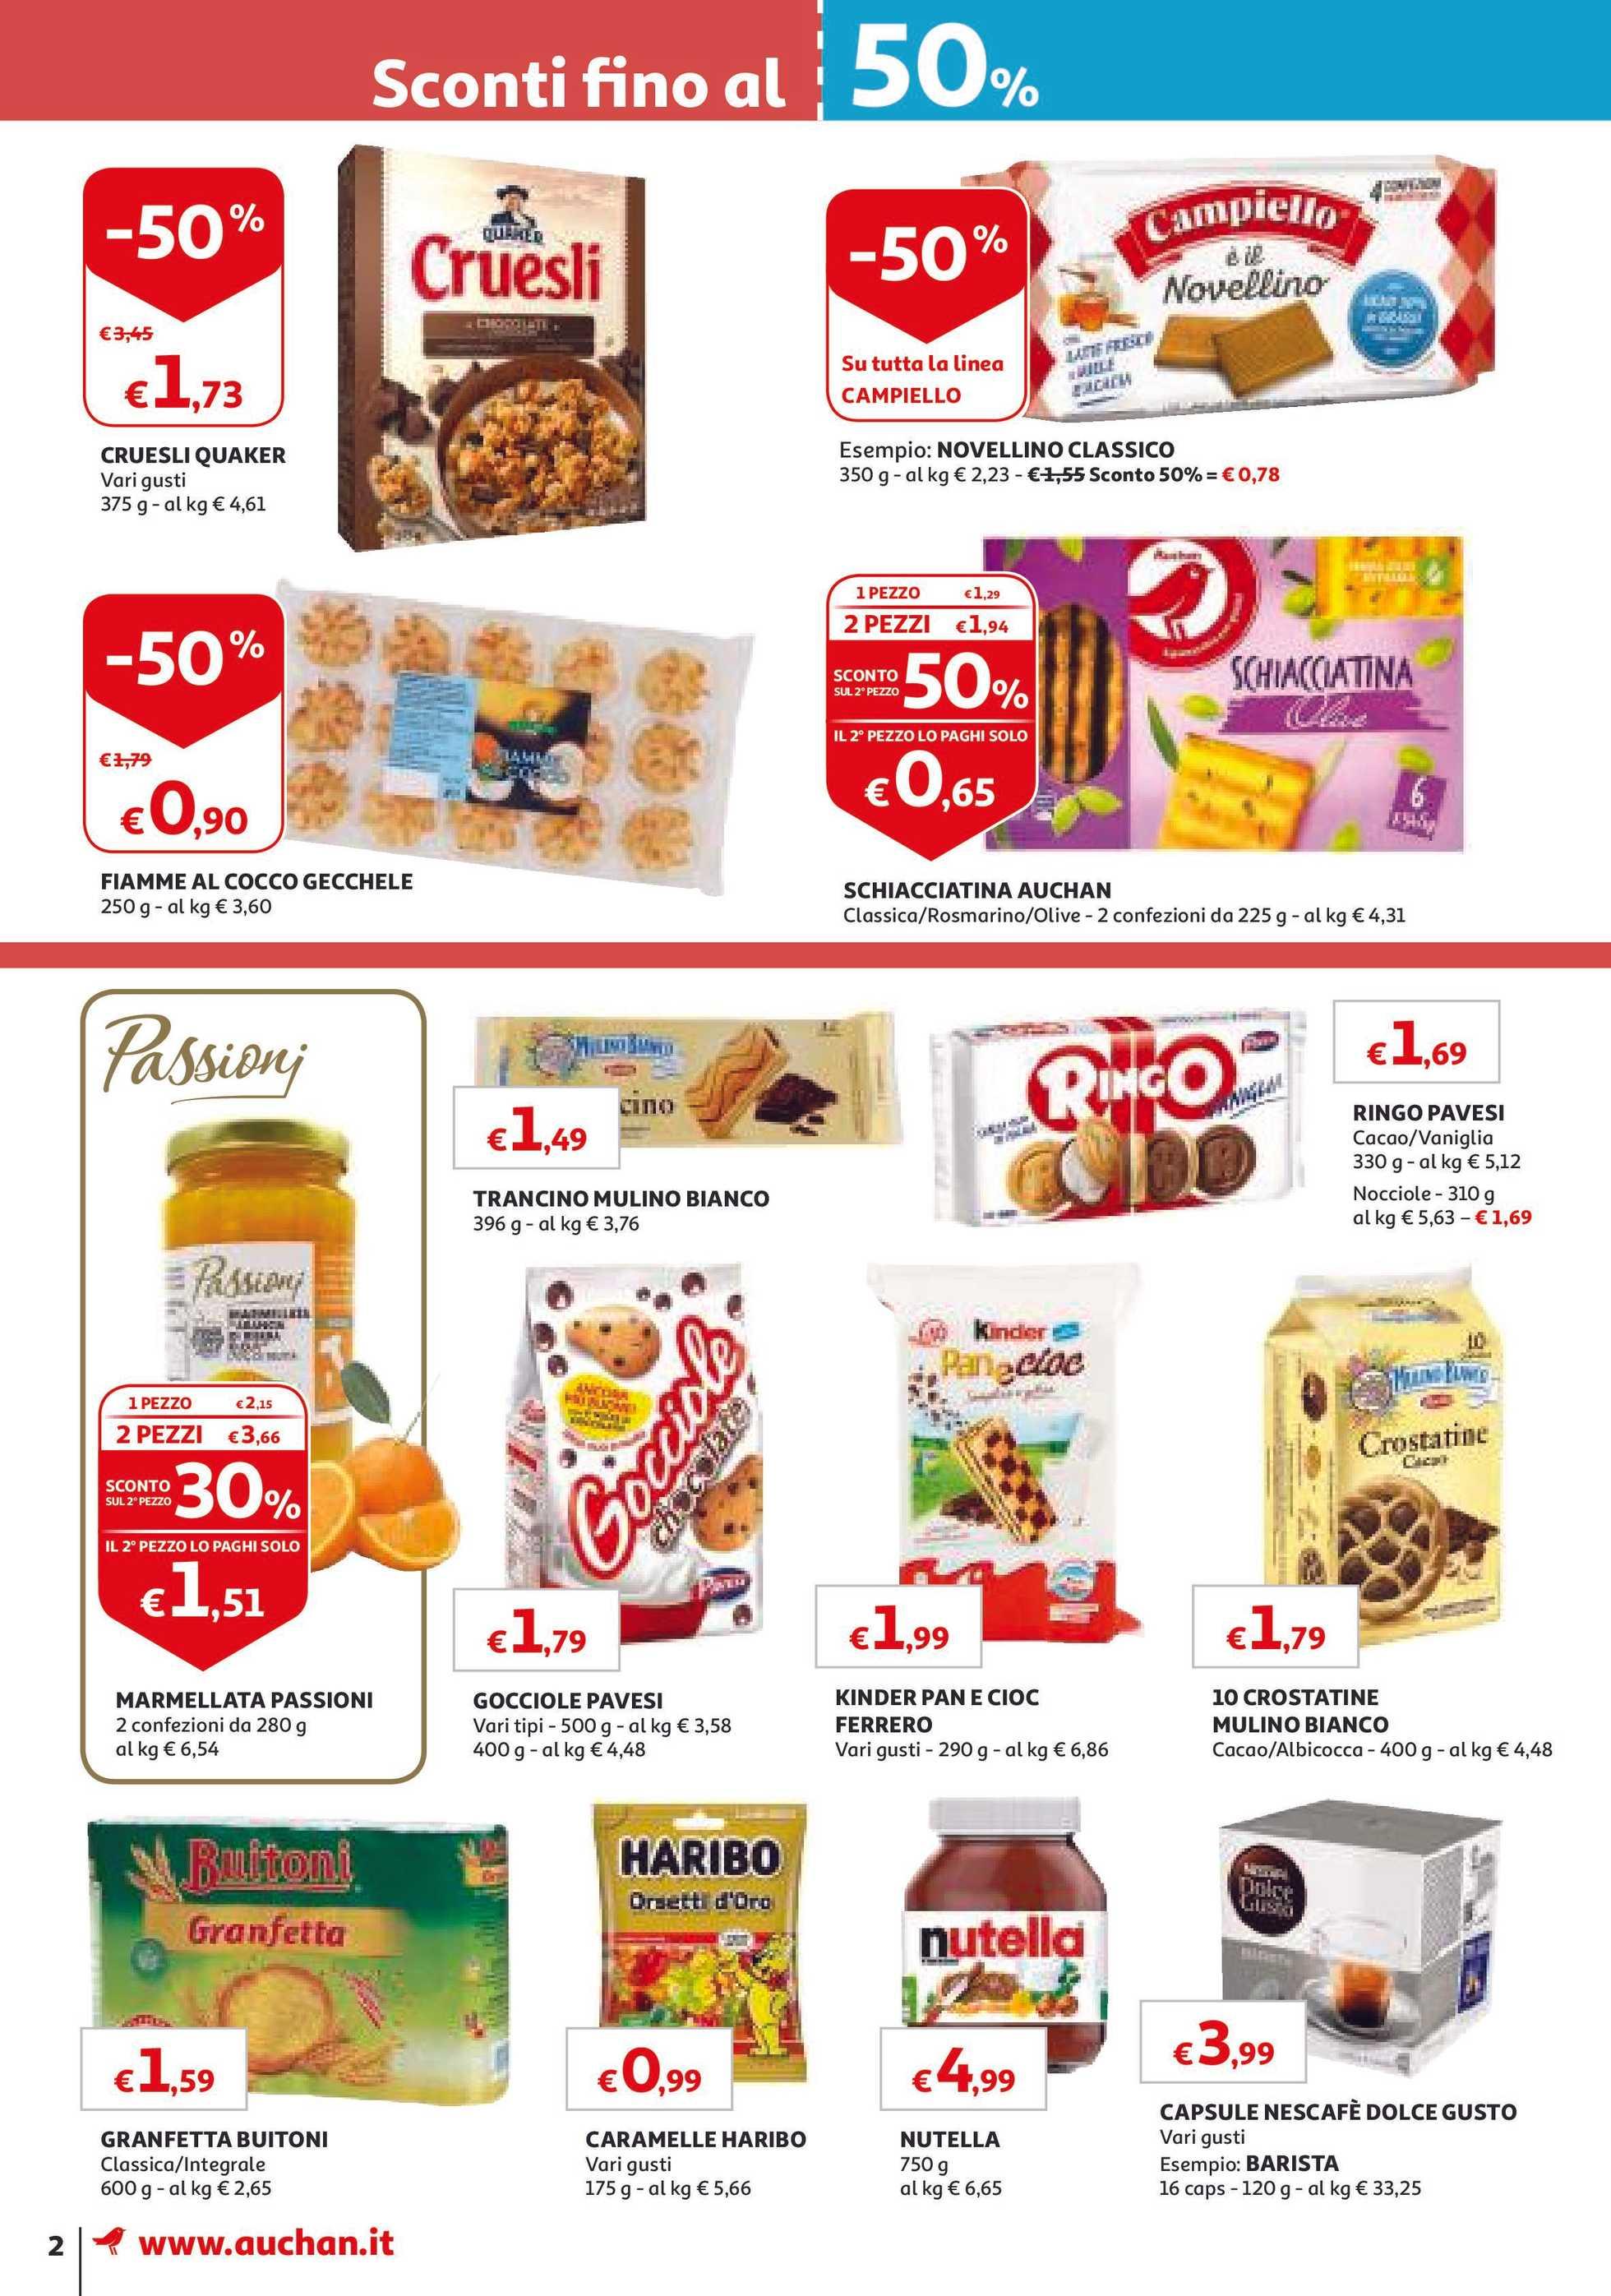 Volantino Auchan Le Ultime Offerte Itpromotonscom